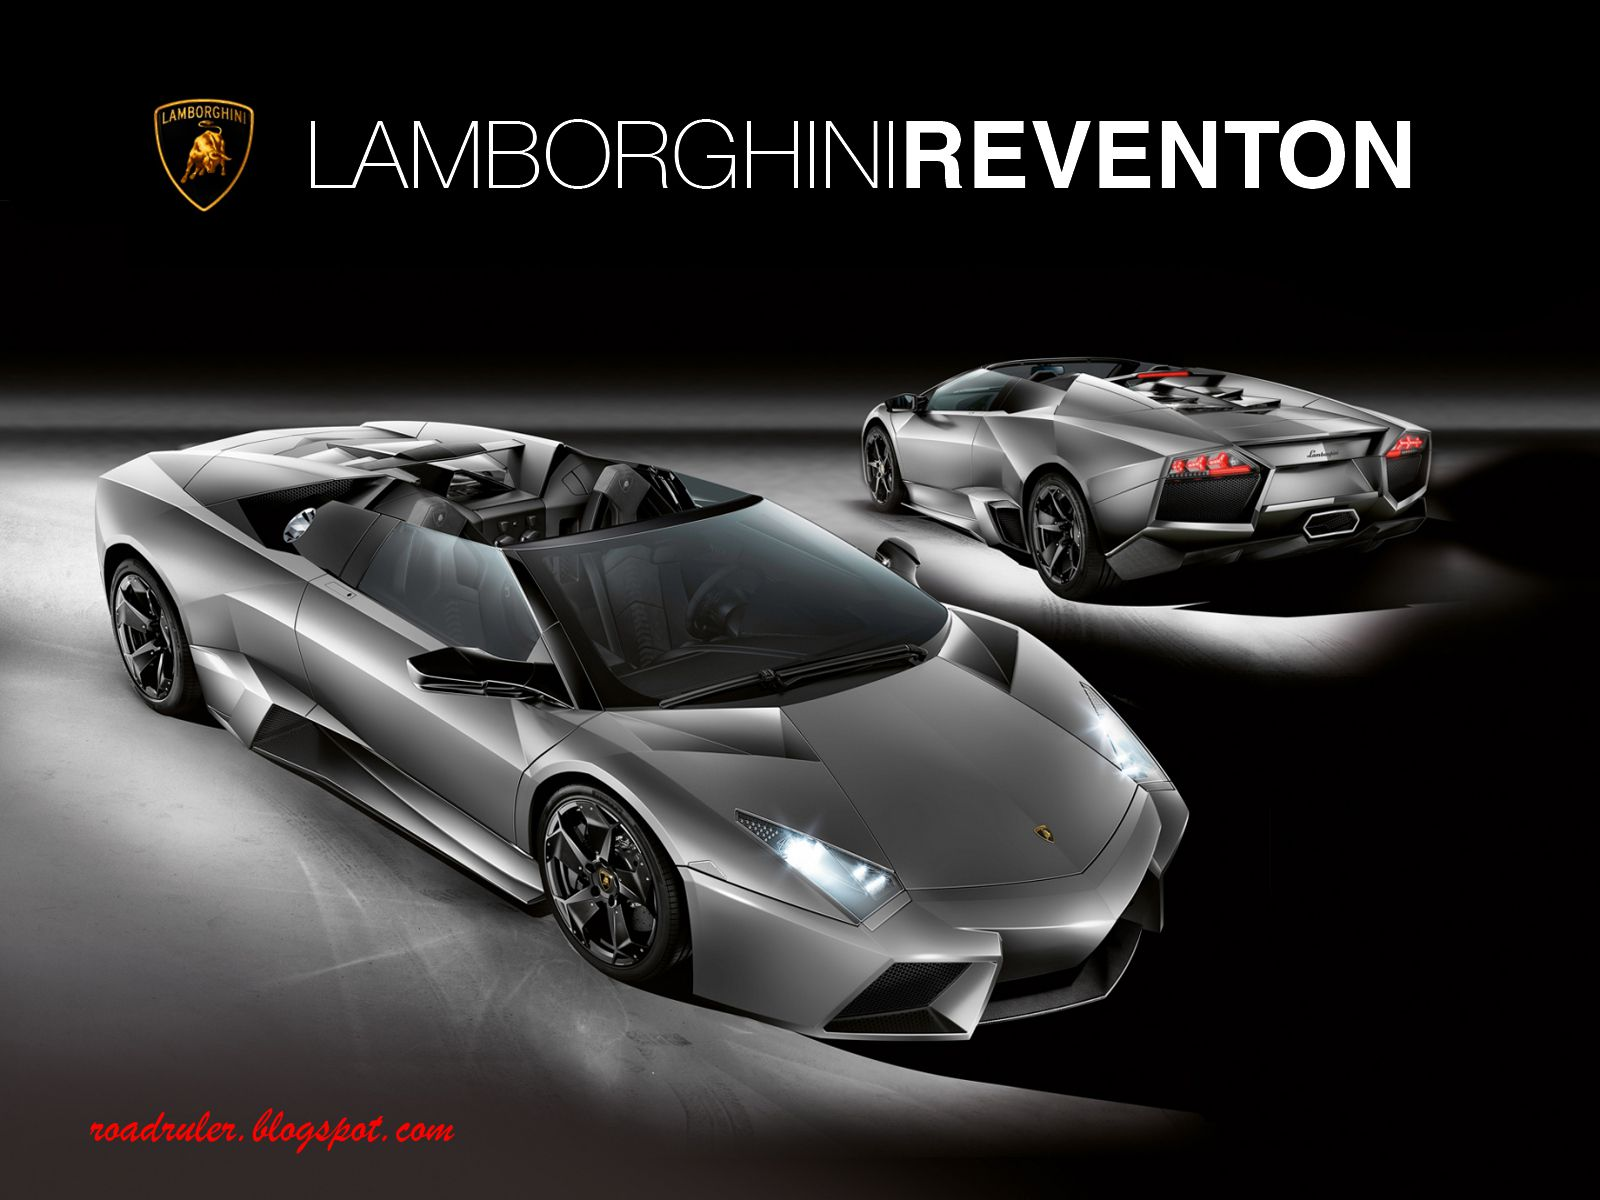 Charmant Lamborghini Reventon Roadster